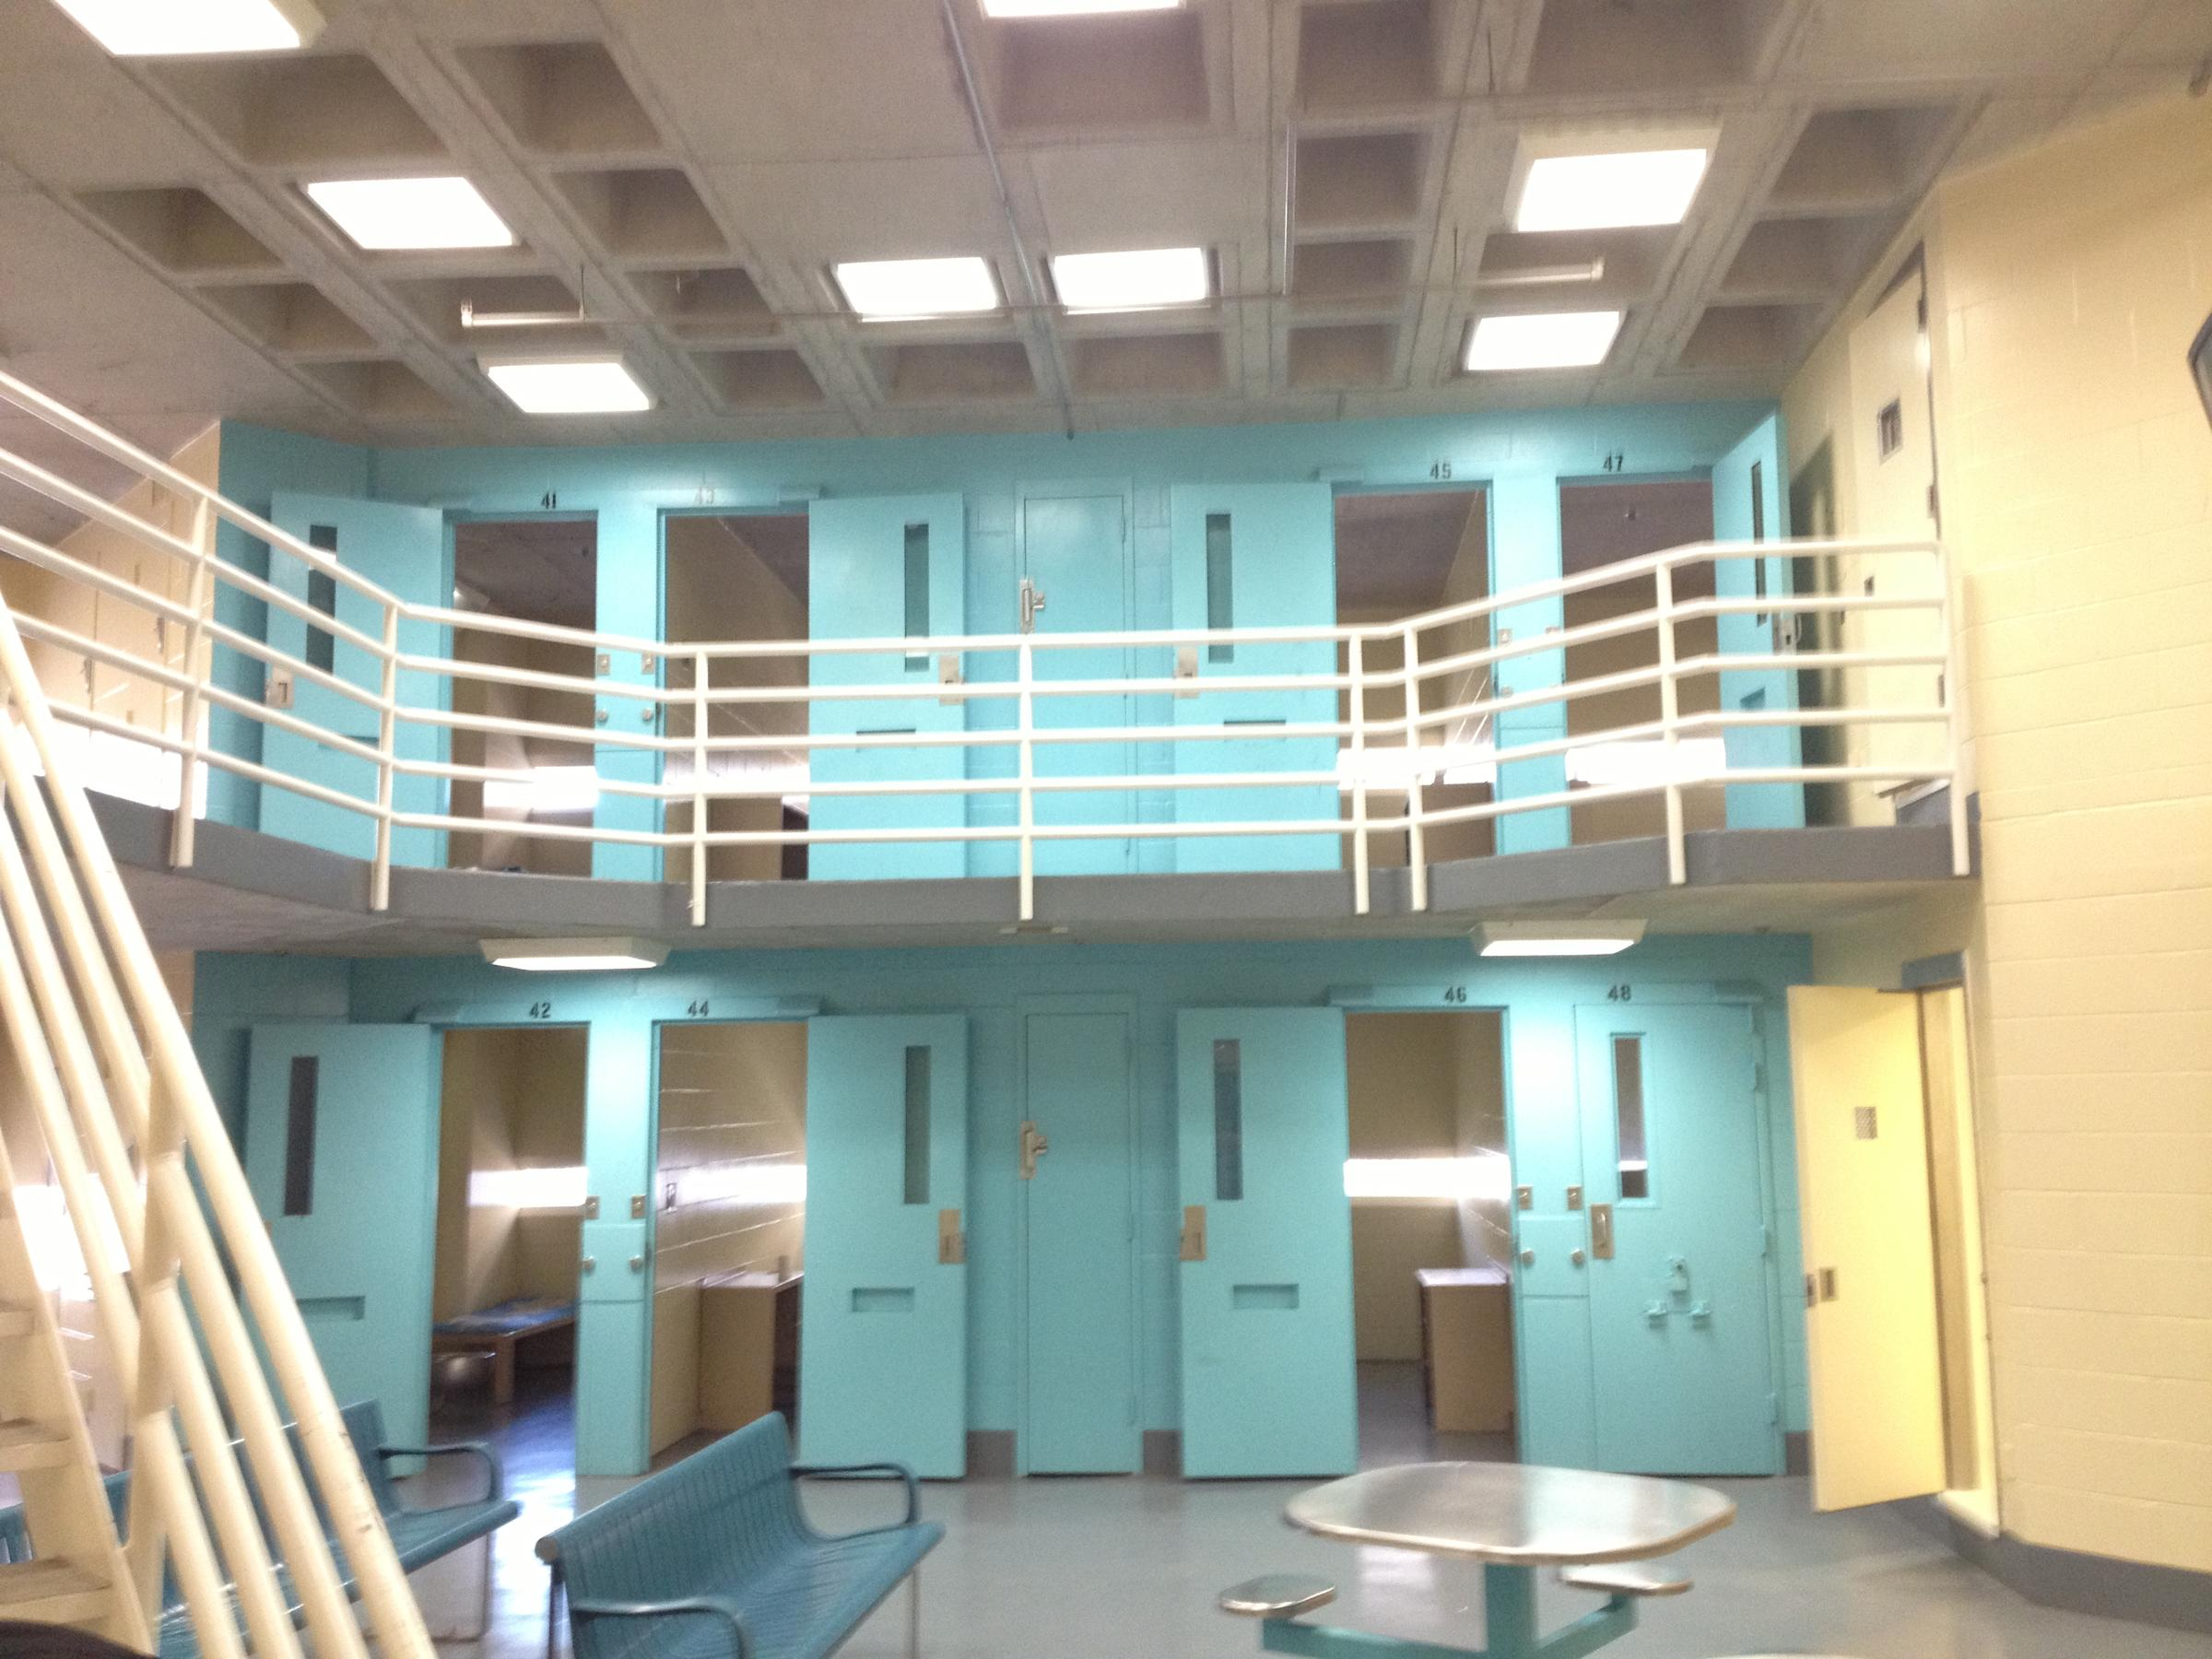 Hamilton County Justice Center Inmate Phone Calls